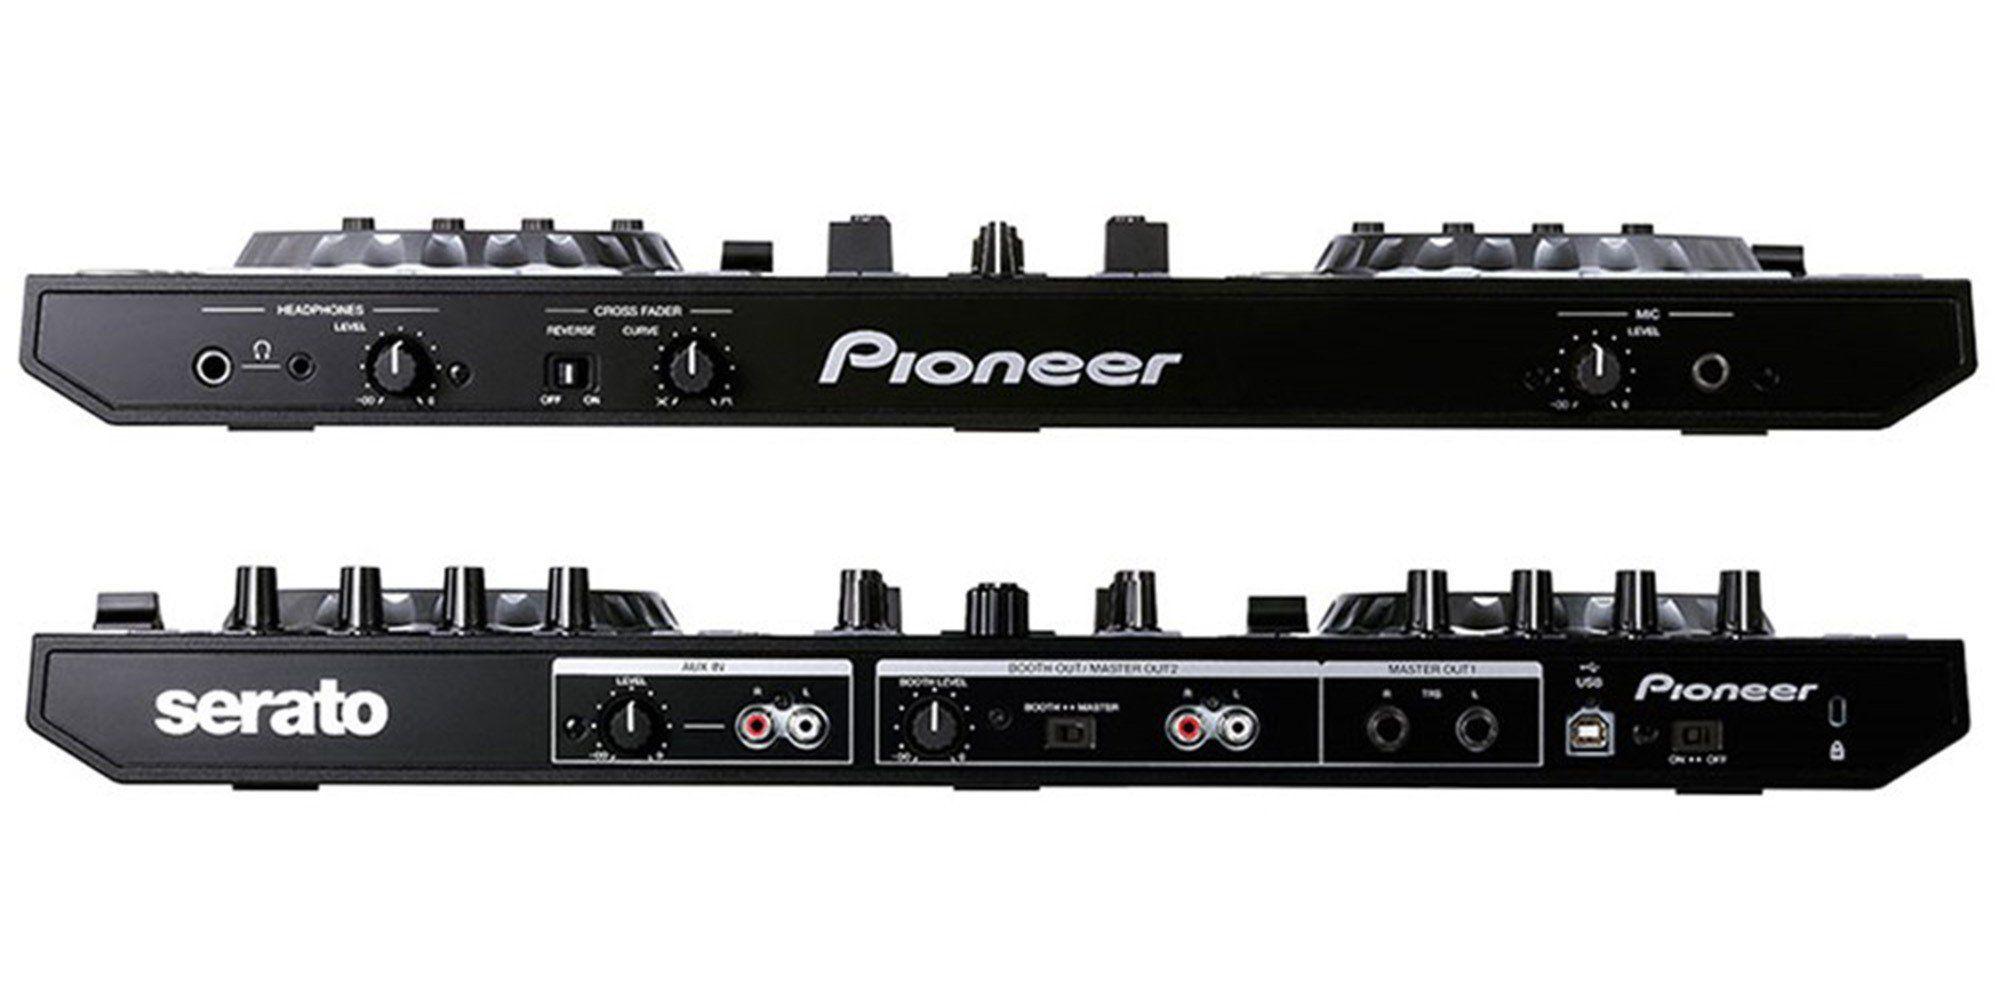 Pioneer DDJ-SR2 Controladora Dj DDJ SR2 2-Canais 4-Decks Serato